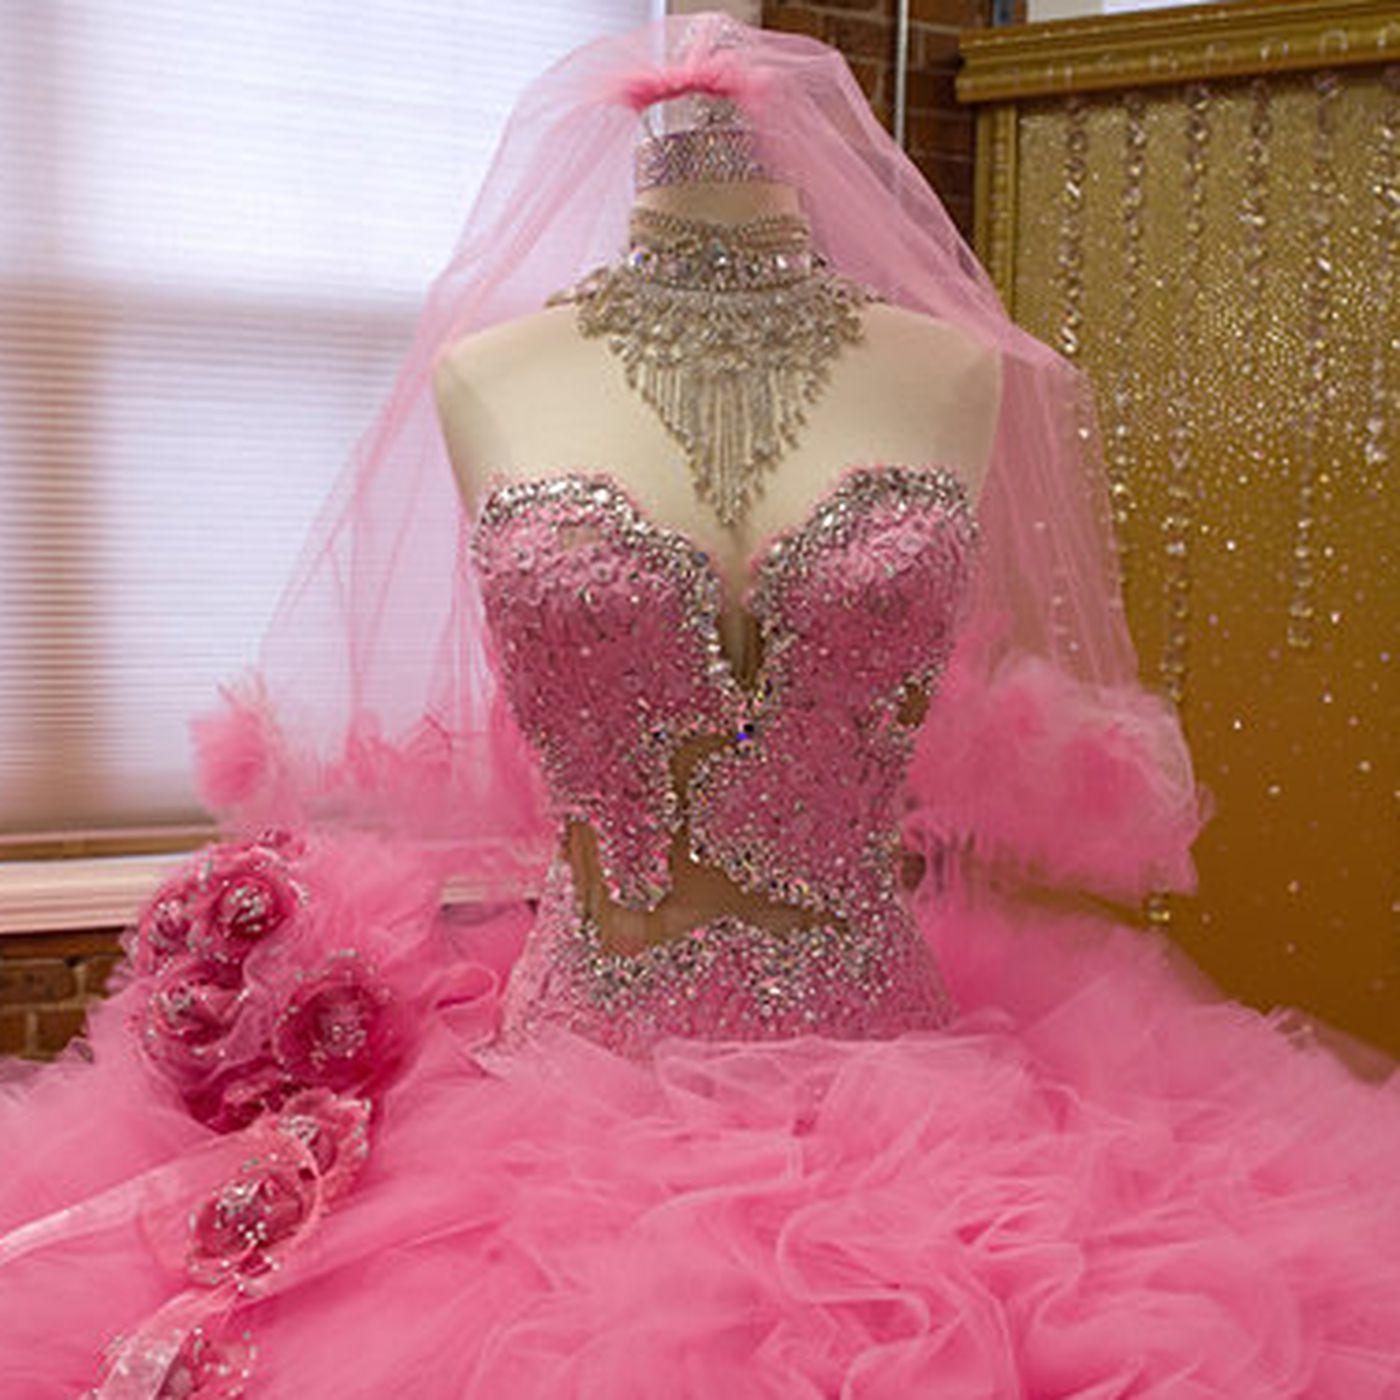 My Big Fat American Gypsy Wedding S Sondra Celli On Rhinestoning Everything Racked,Mother In Law Wears Wedding Dress To Sons Wedding